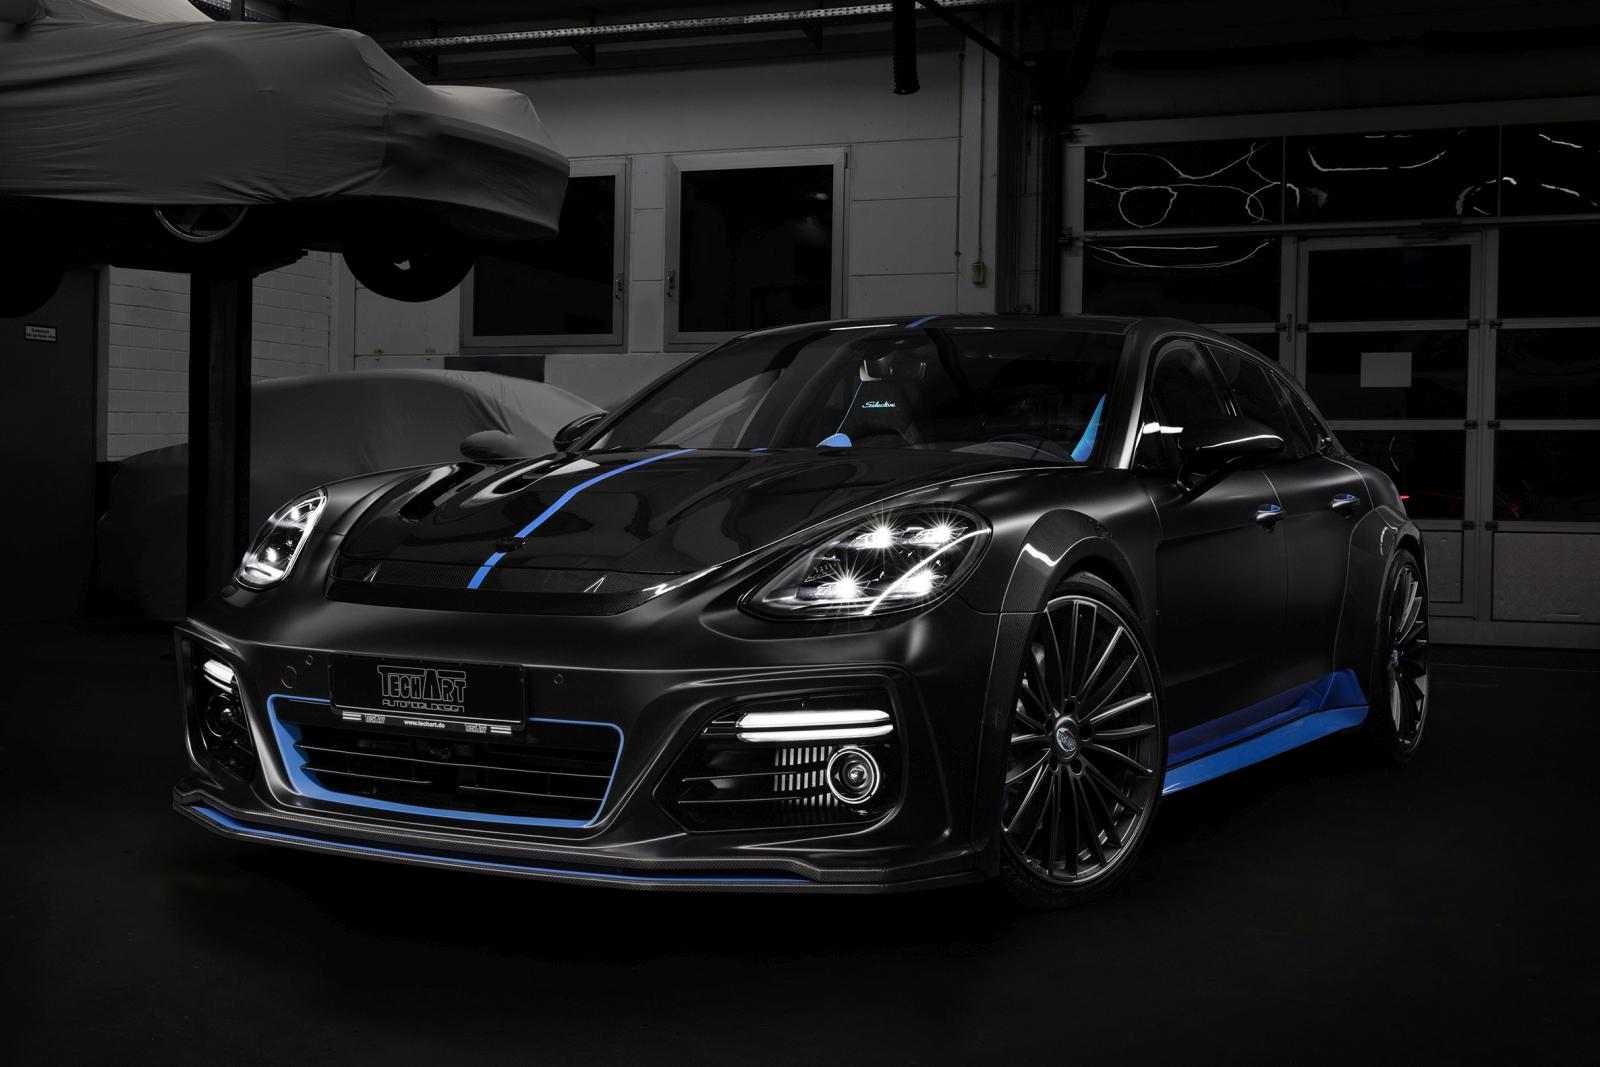 Techart Grand GT Selective